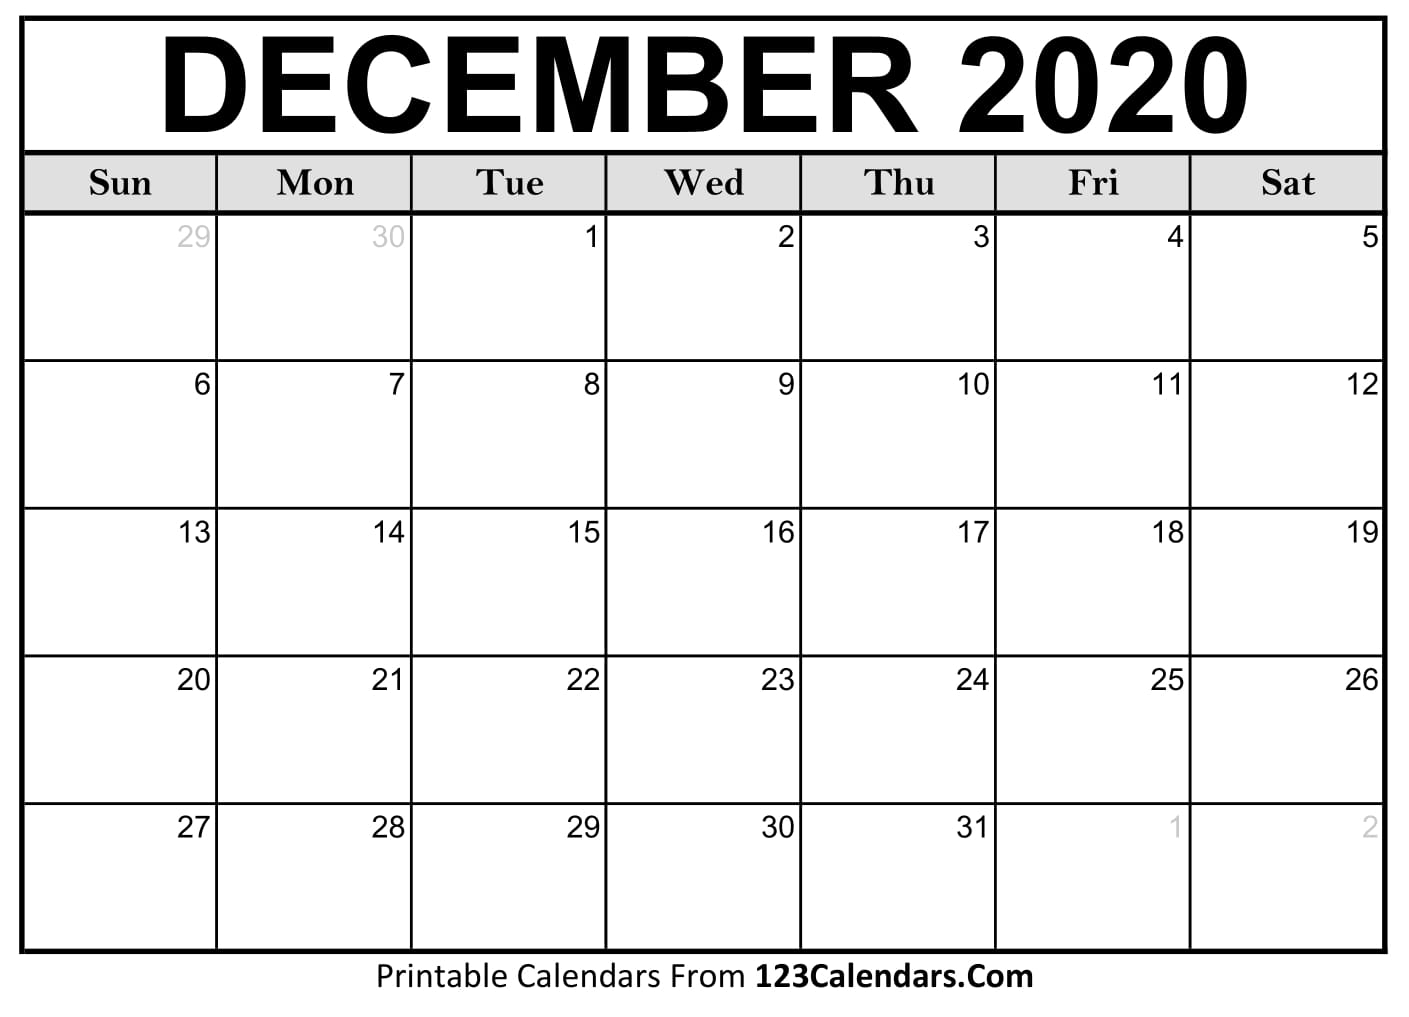 29+ Large Print Free Printable Calendars September 2020 PNG